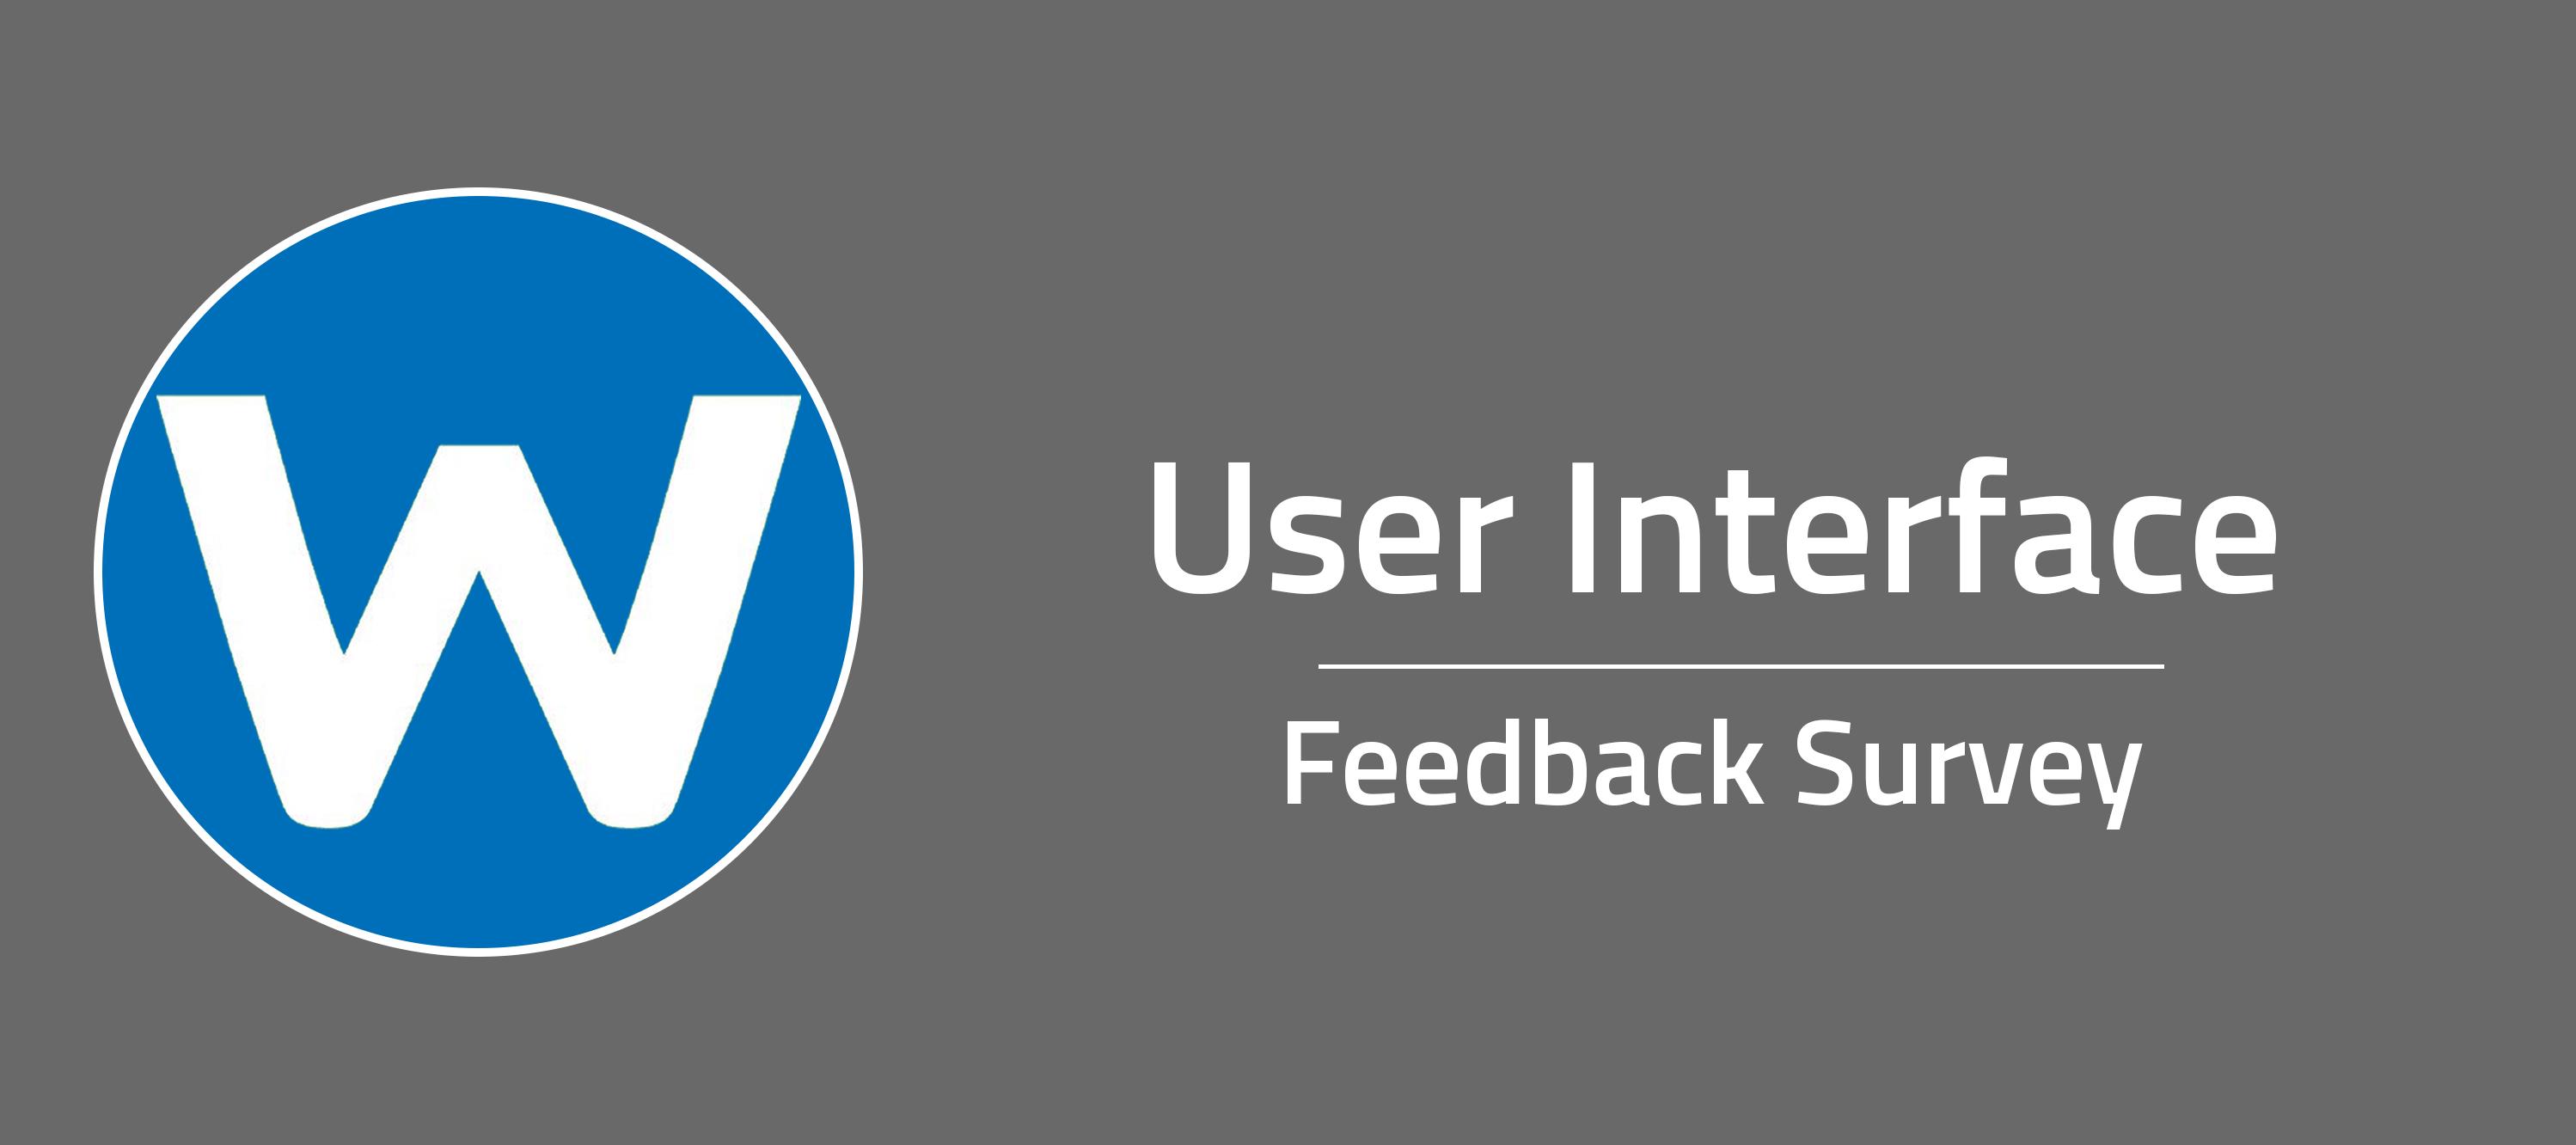 User Interface Feedback Survey